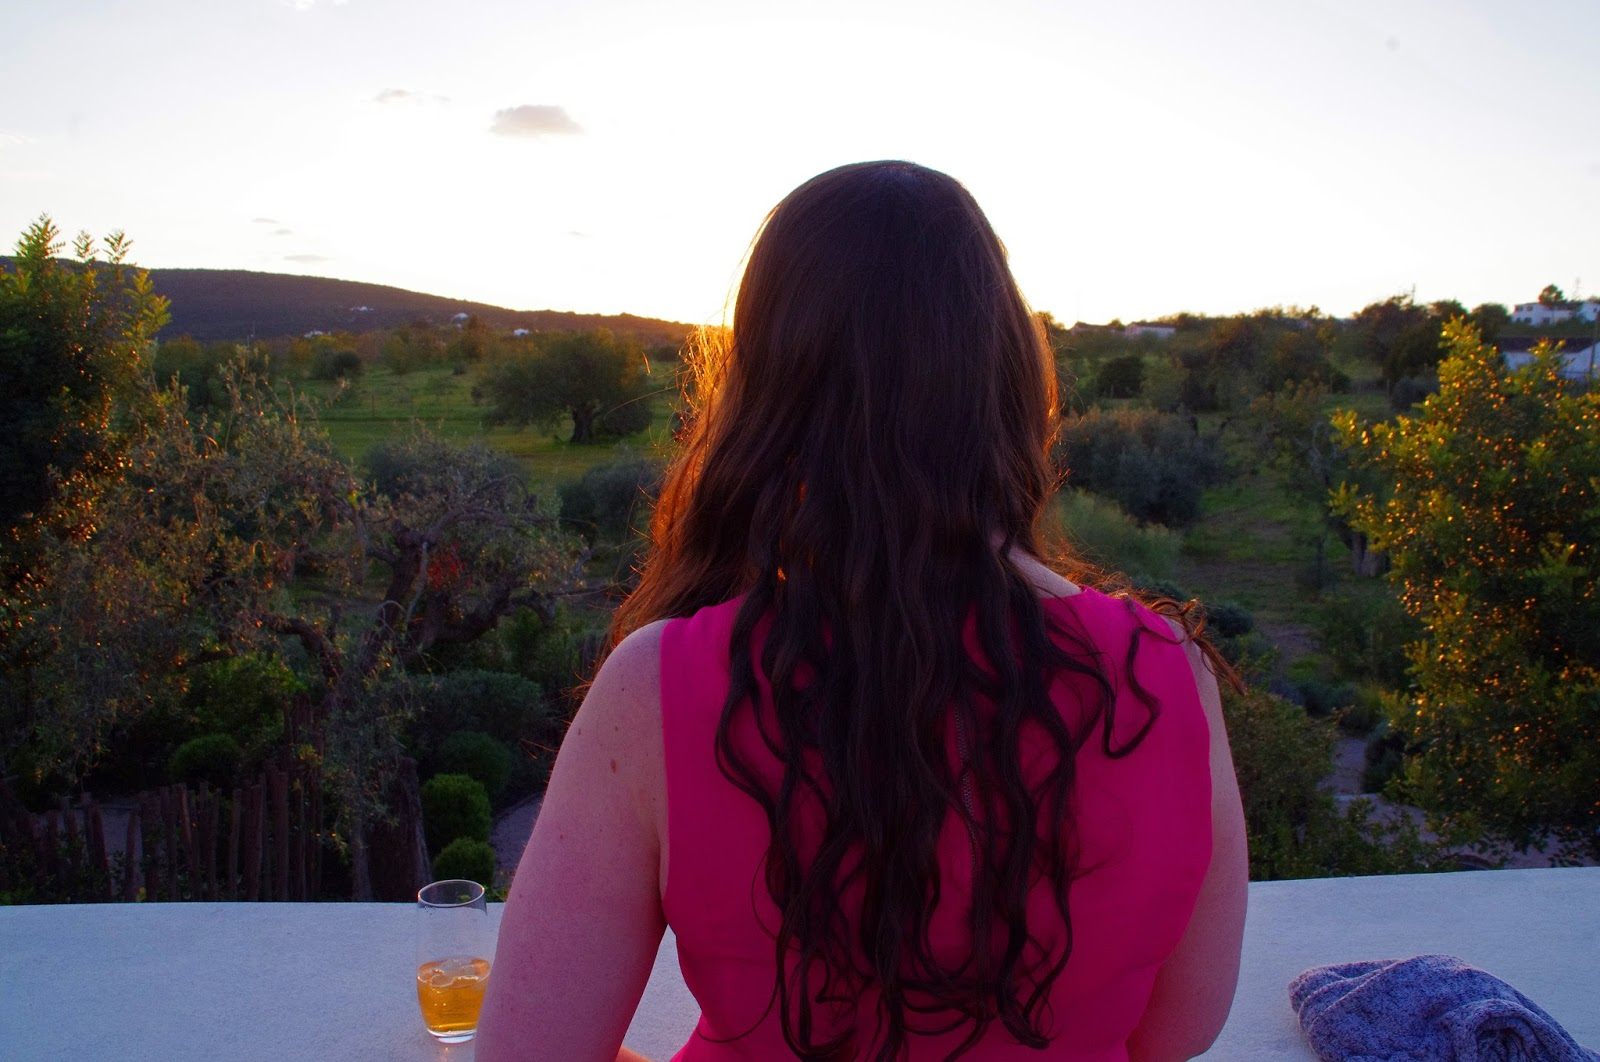 Simone at Fazenda Nova Country House at sunset